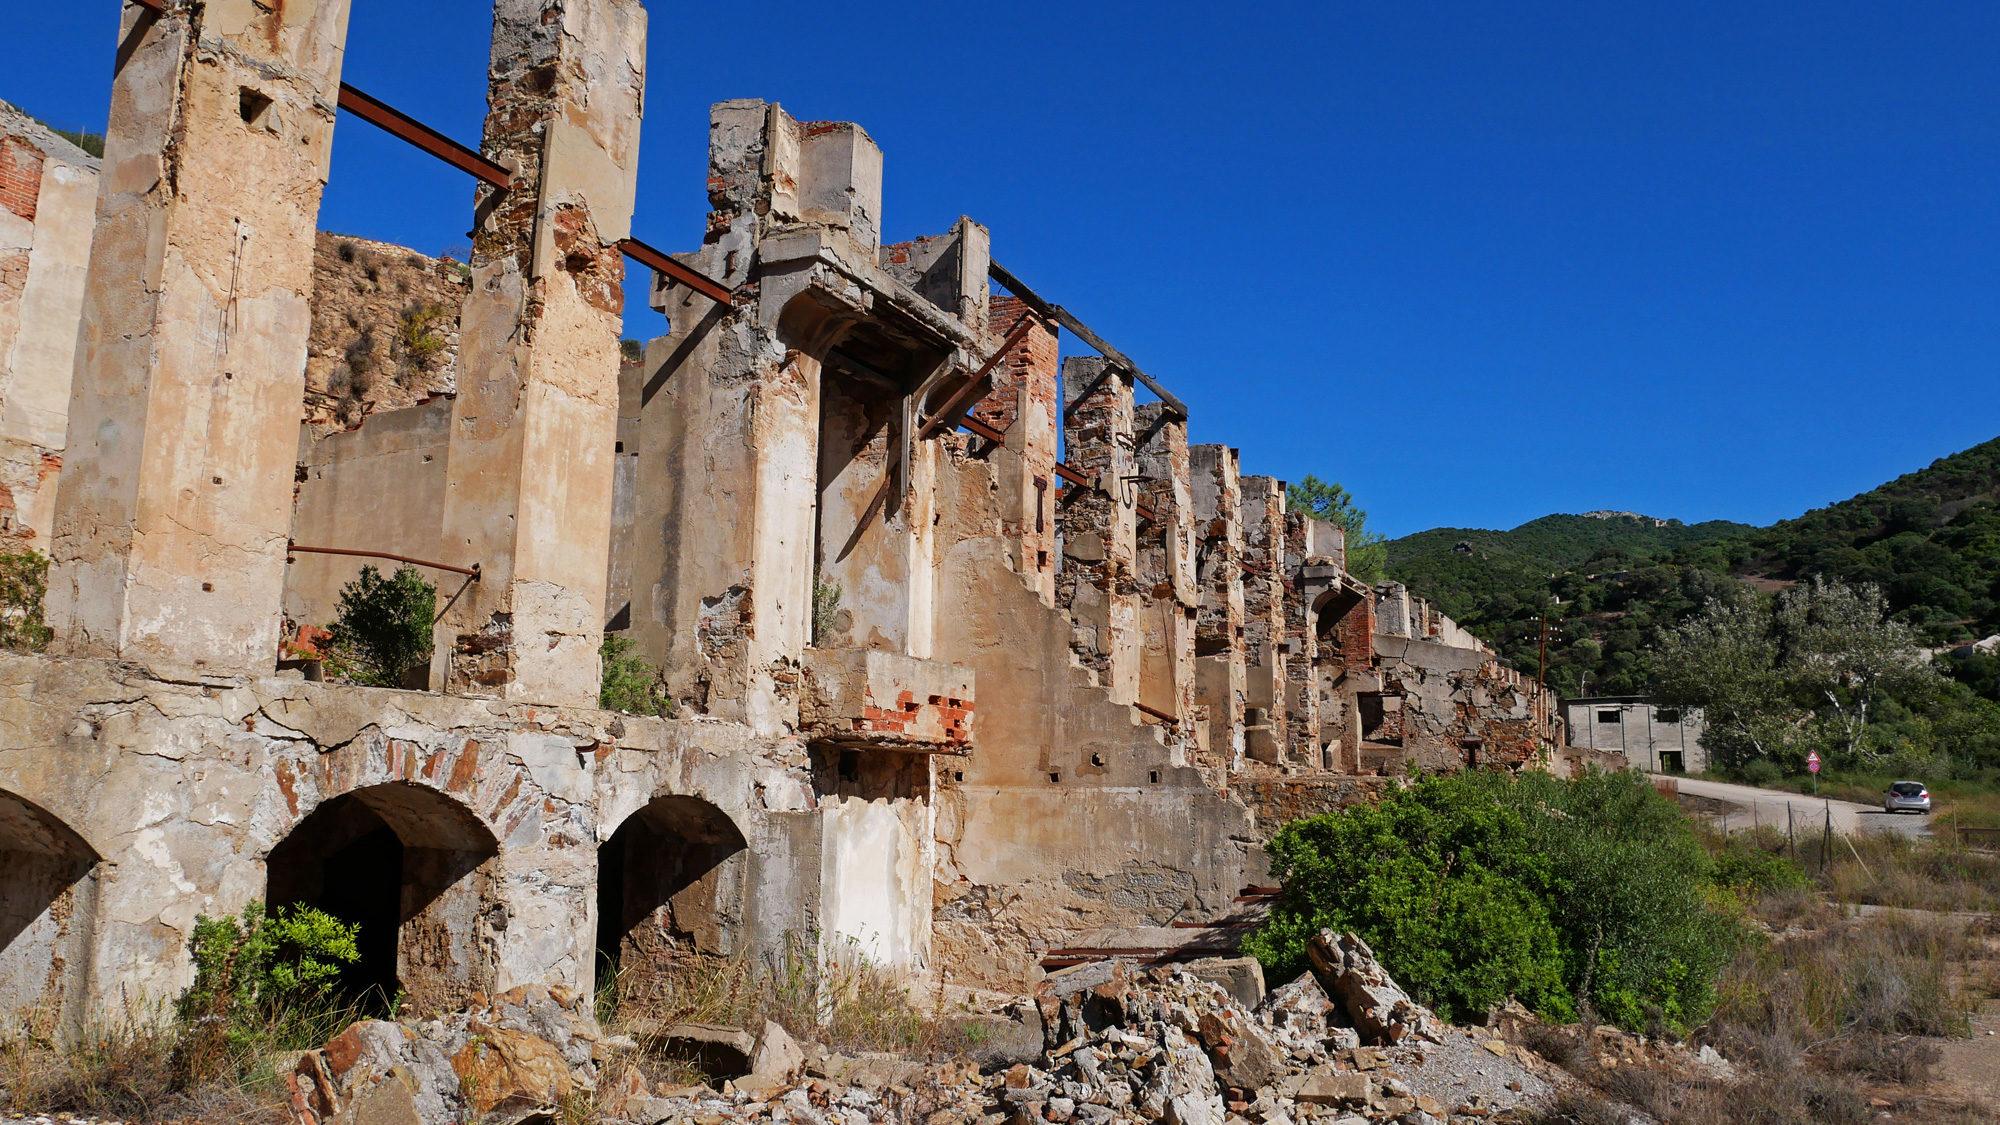 Morbider Charme der Miniera di Naracauli